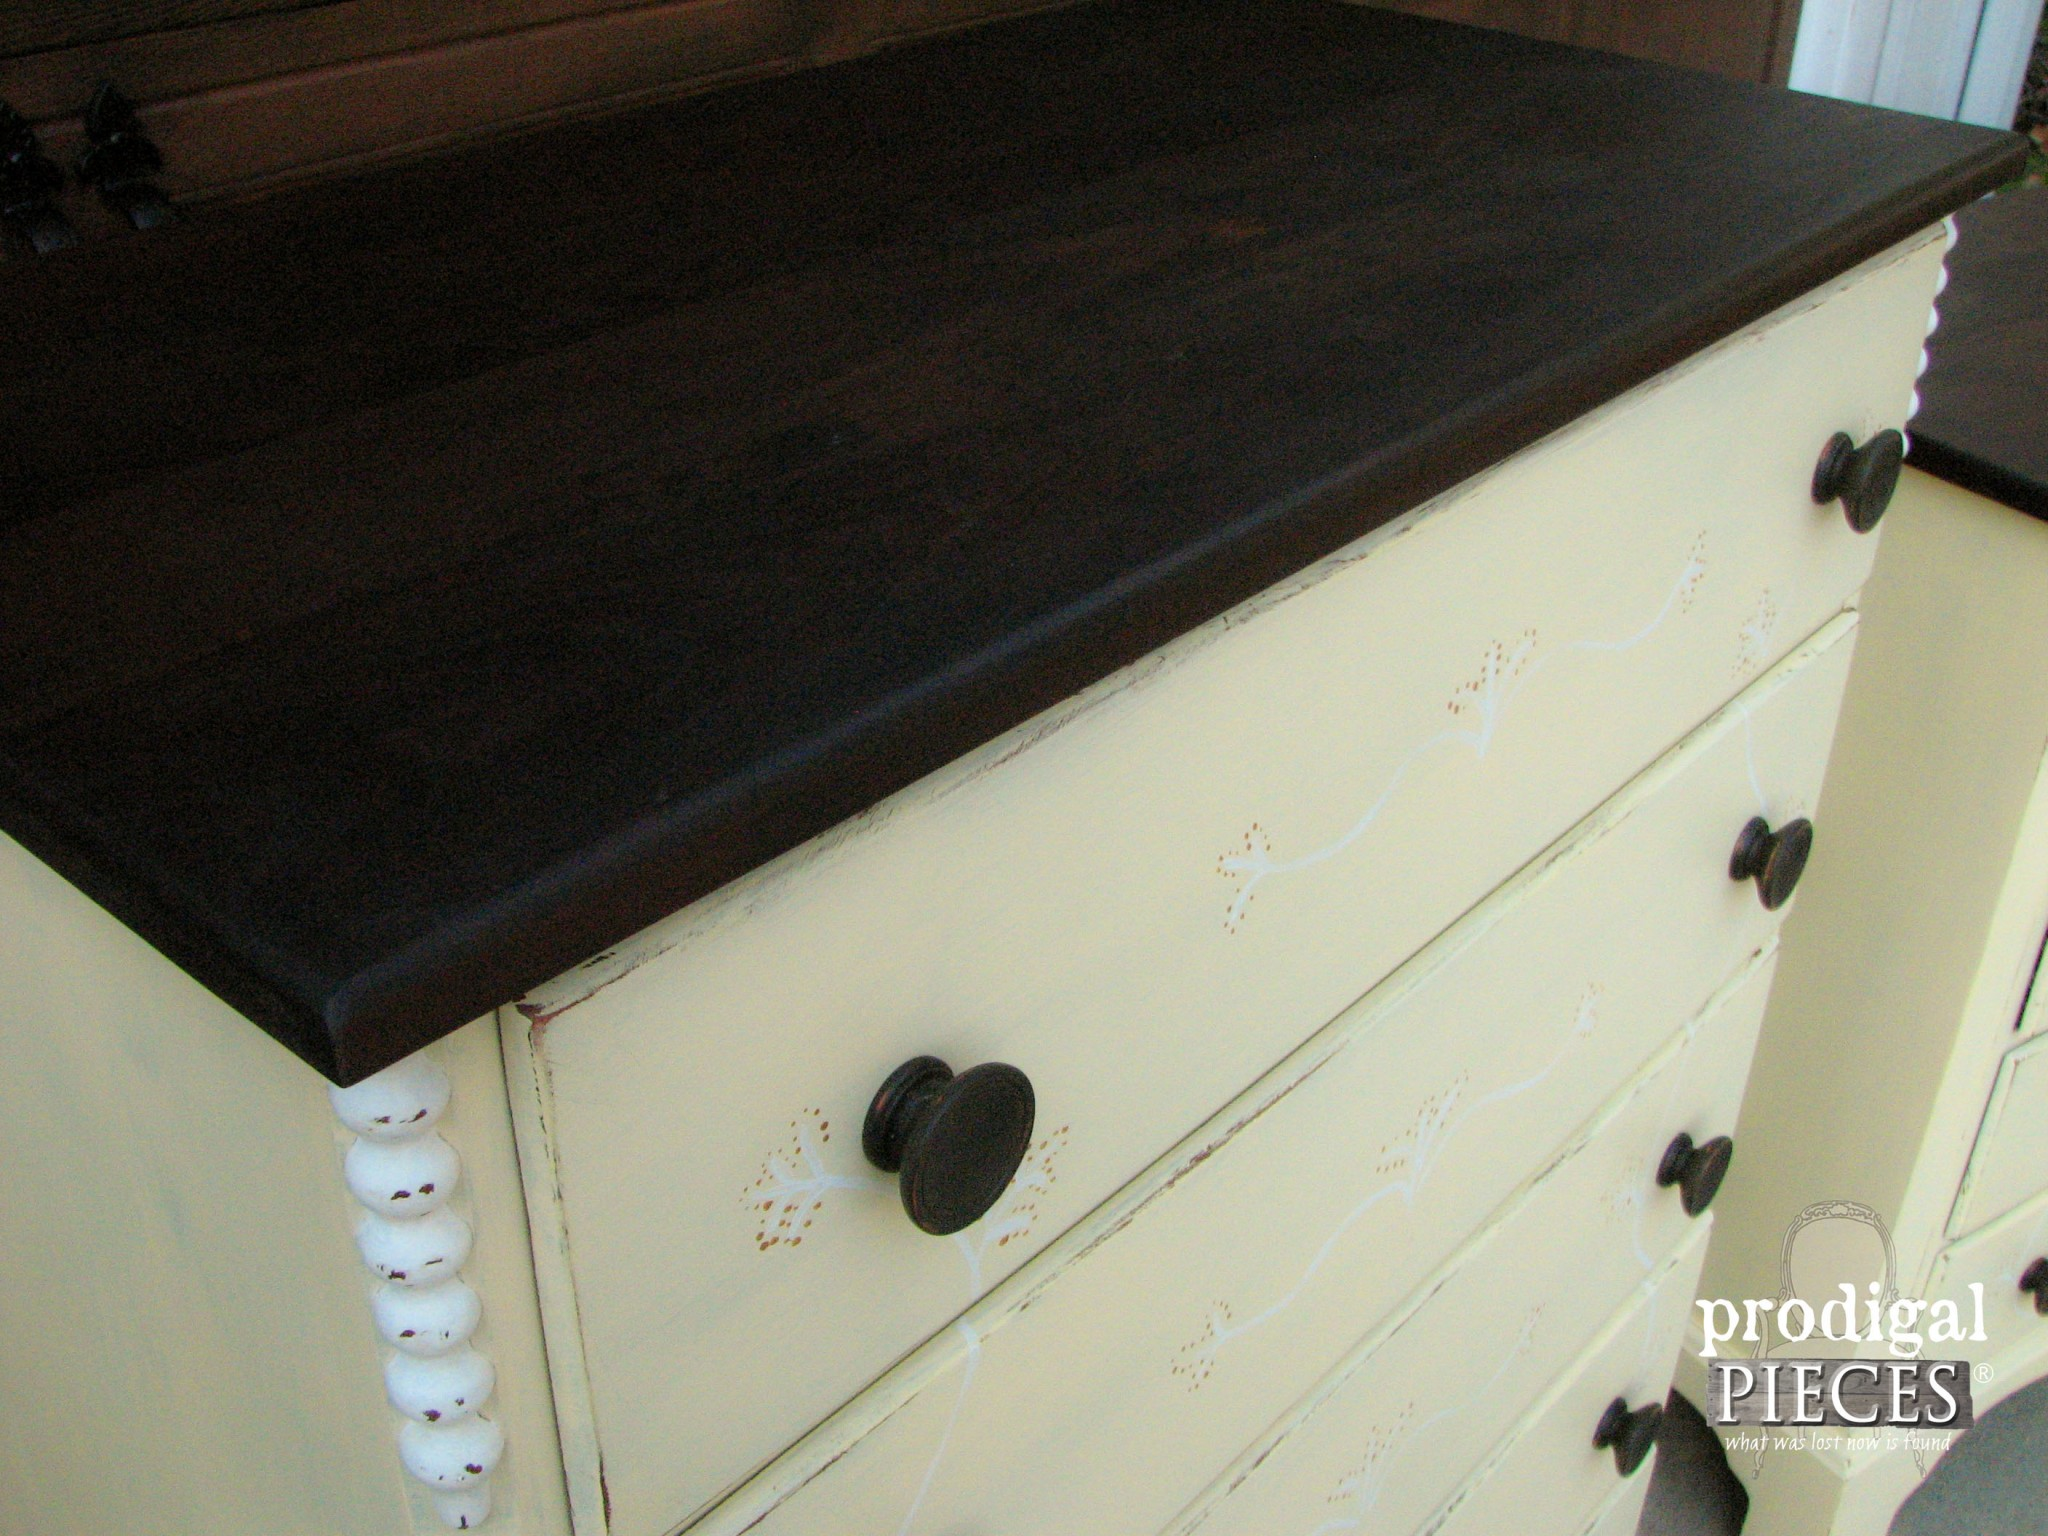 Espresso Stain on Bedroom Set Tops | Prodigal Pieces | www.prodigalpieces.com